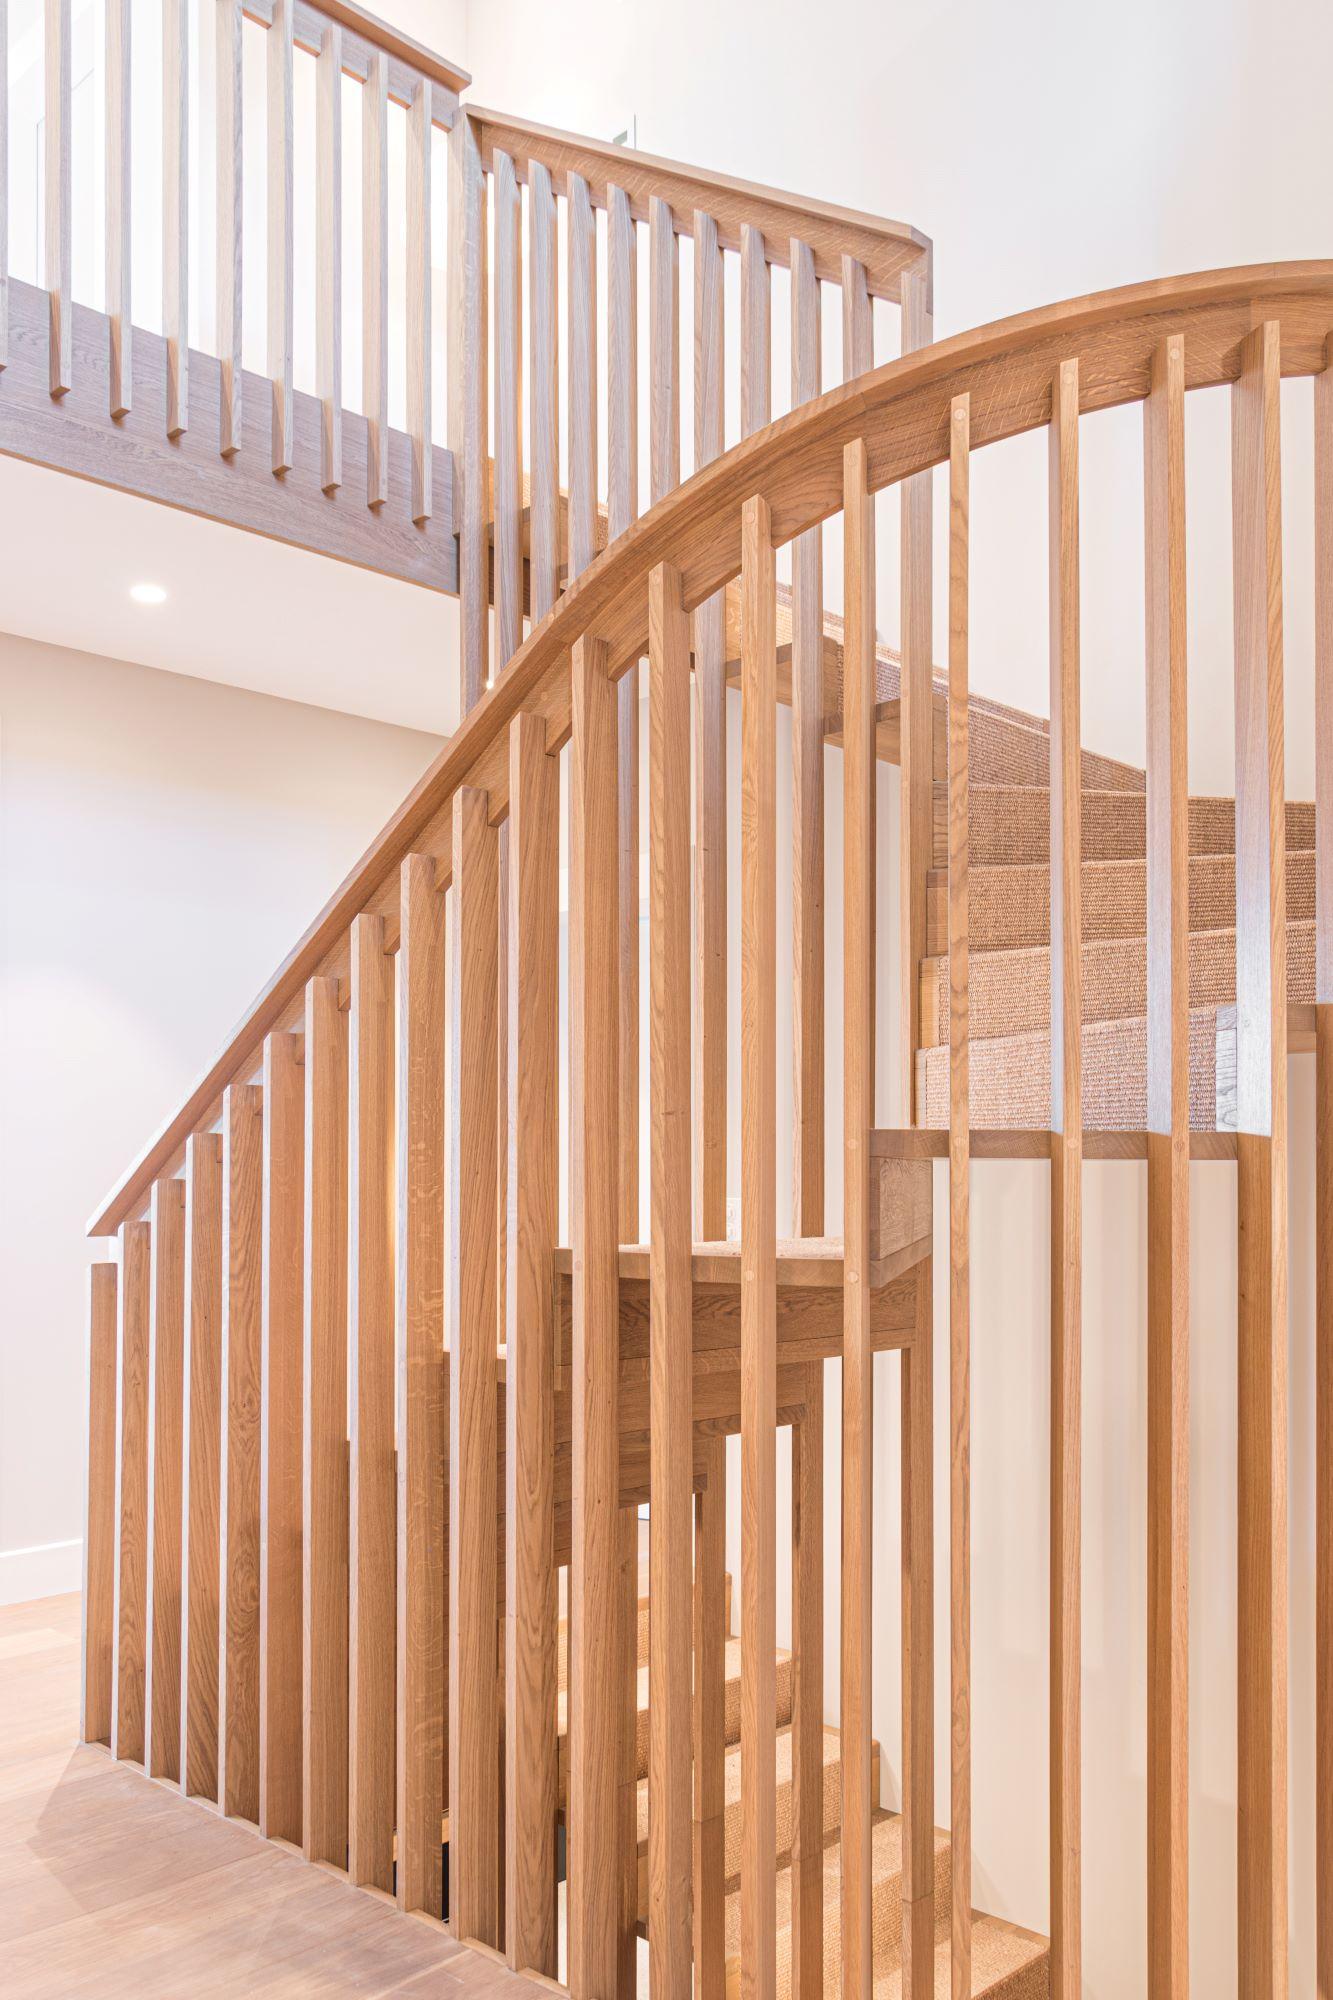 Stair Image 2303